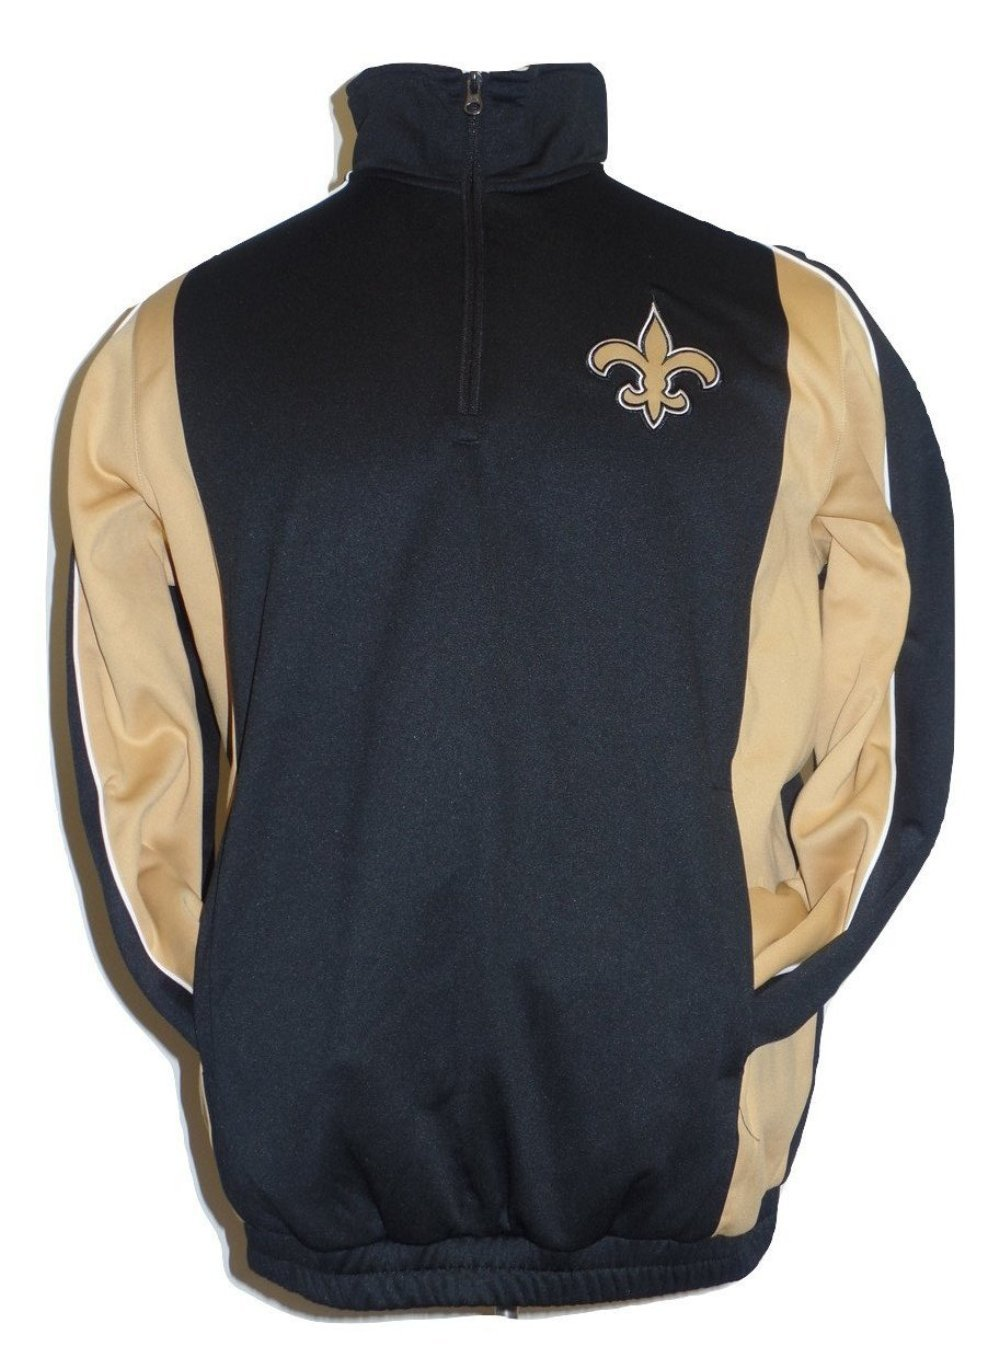 New Orleans Saints Men's Black Performance Fleece Track Jacket by G-III Sports